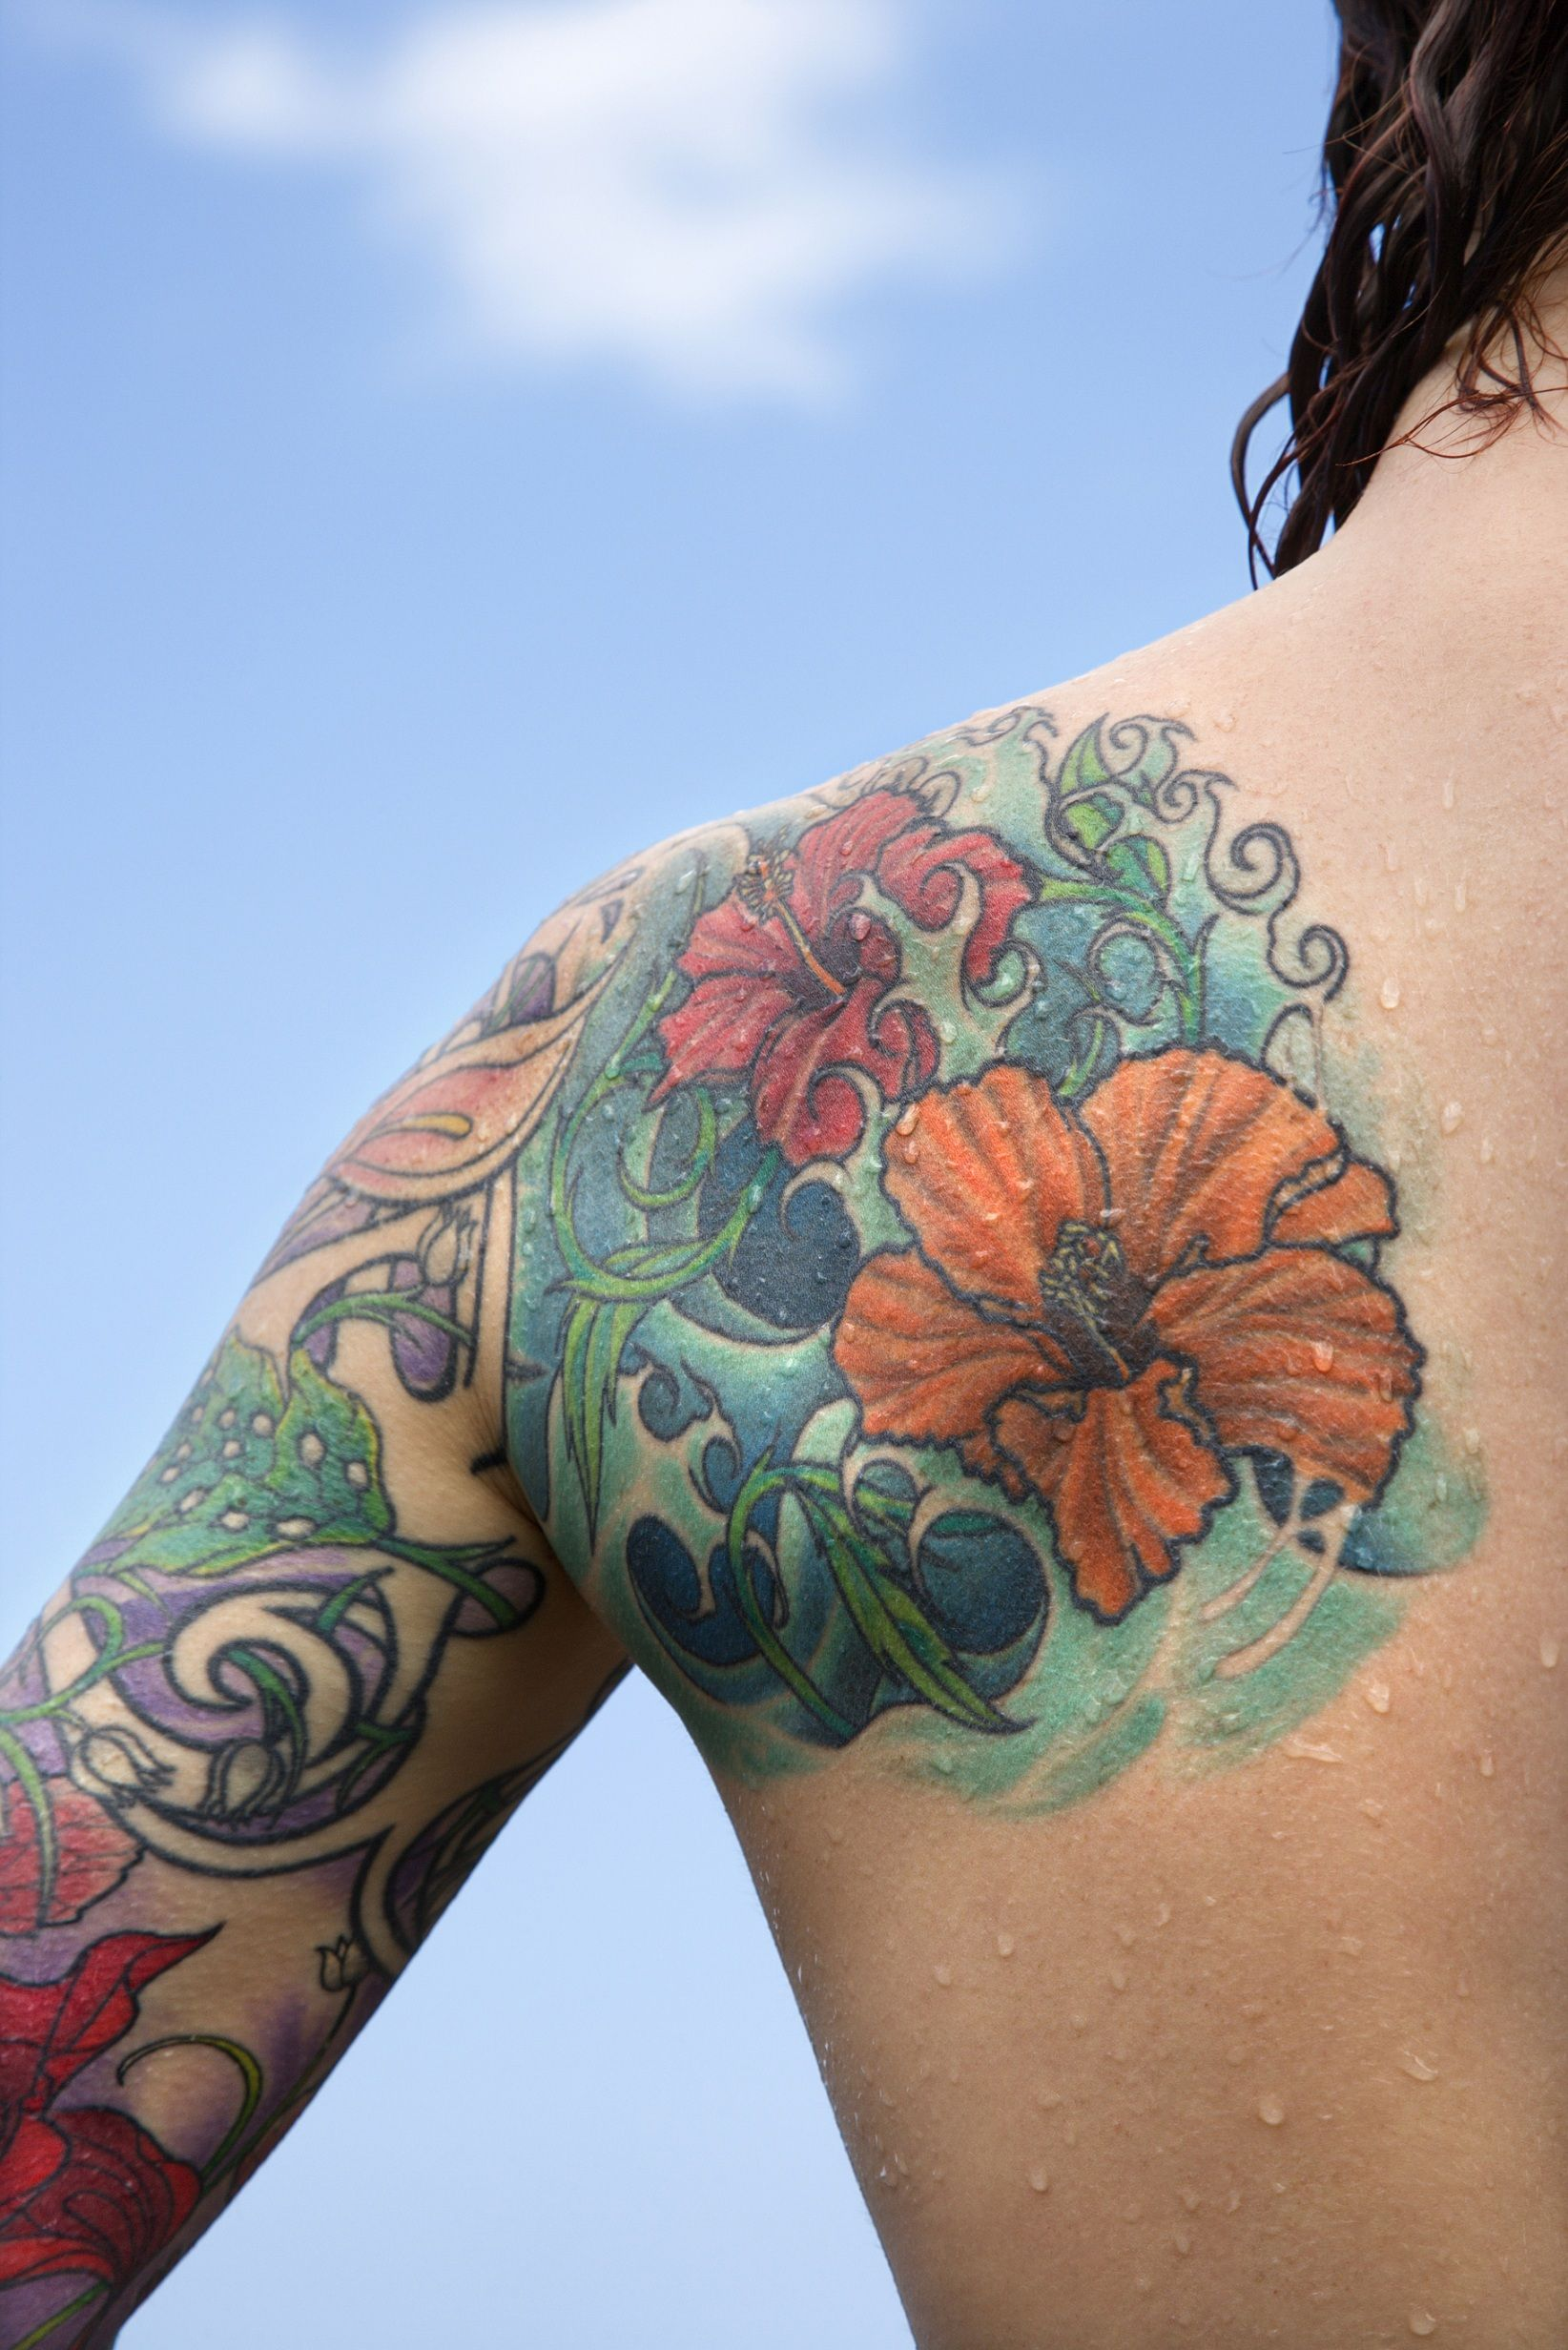 Hibiscus flower tattoos meaning hibiscus flower tattoo designs and hibiscus flower tattoos meaning hibiscus flower tattoo designs and meaning izmirmasajfo